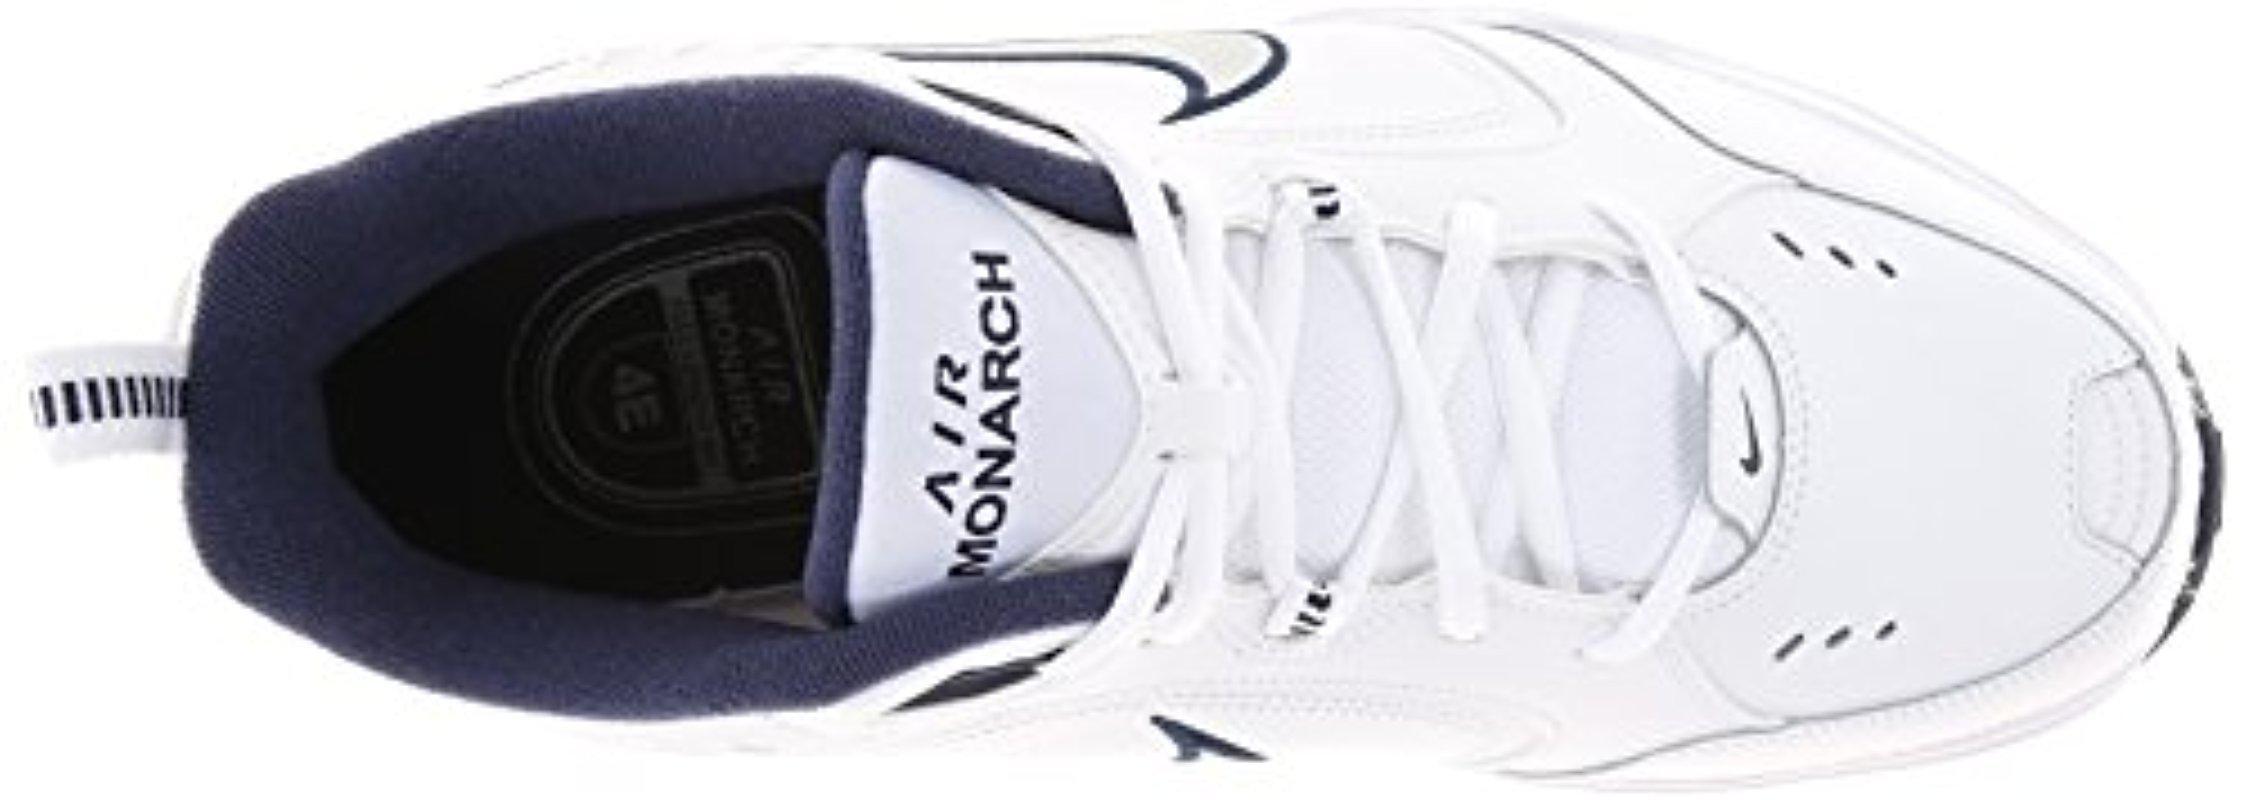 e7868c8ef56182 Lyst - Nike Air Monarch Iv (mens) - 6 White metallic Silver in ...